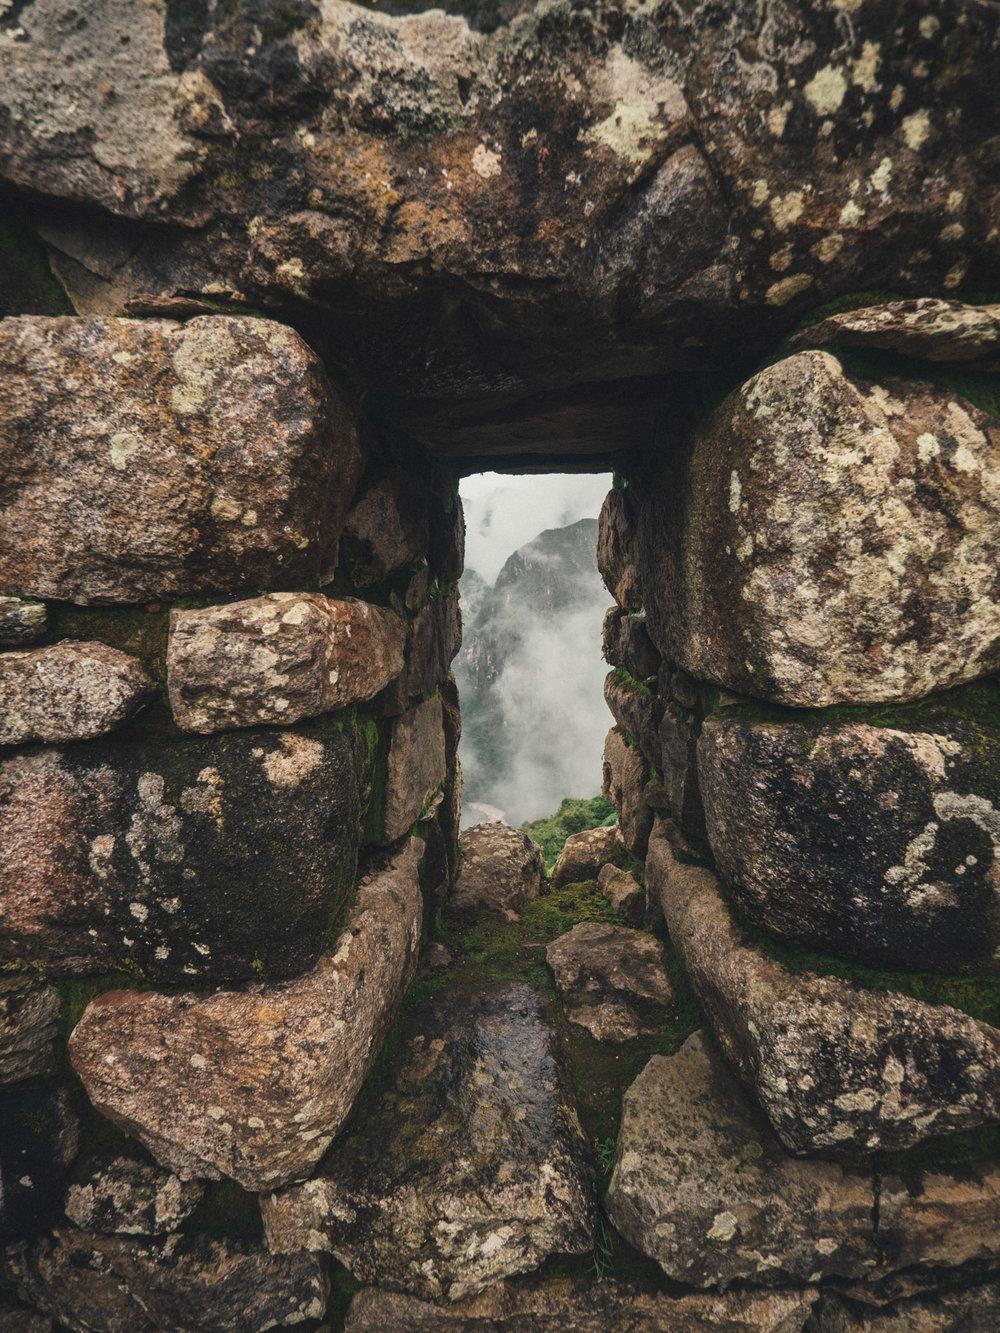 A window in one of the Inca dwellings